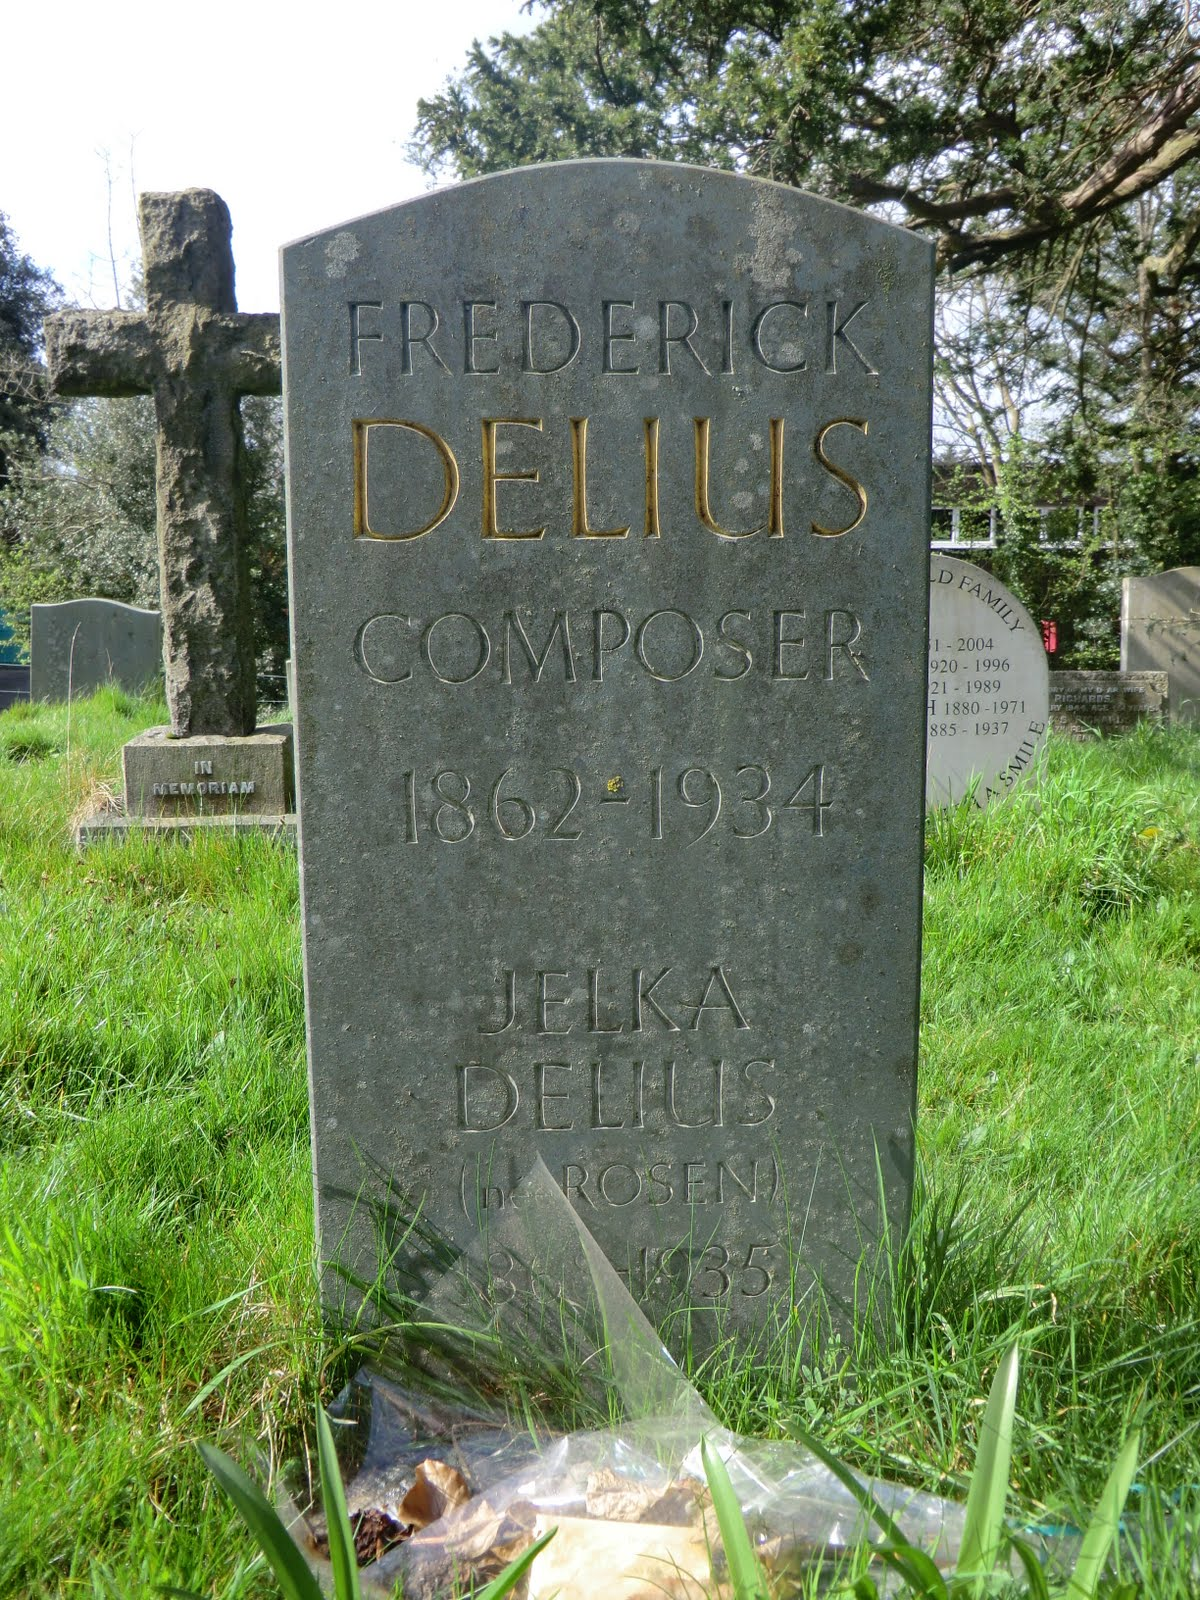 CIMG0325 Delius headstone, Limpsfield church